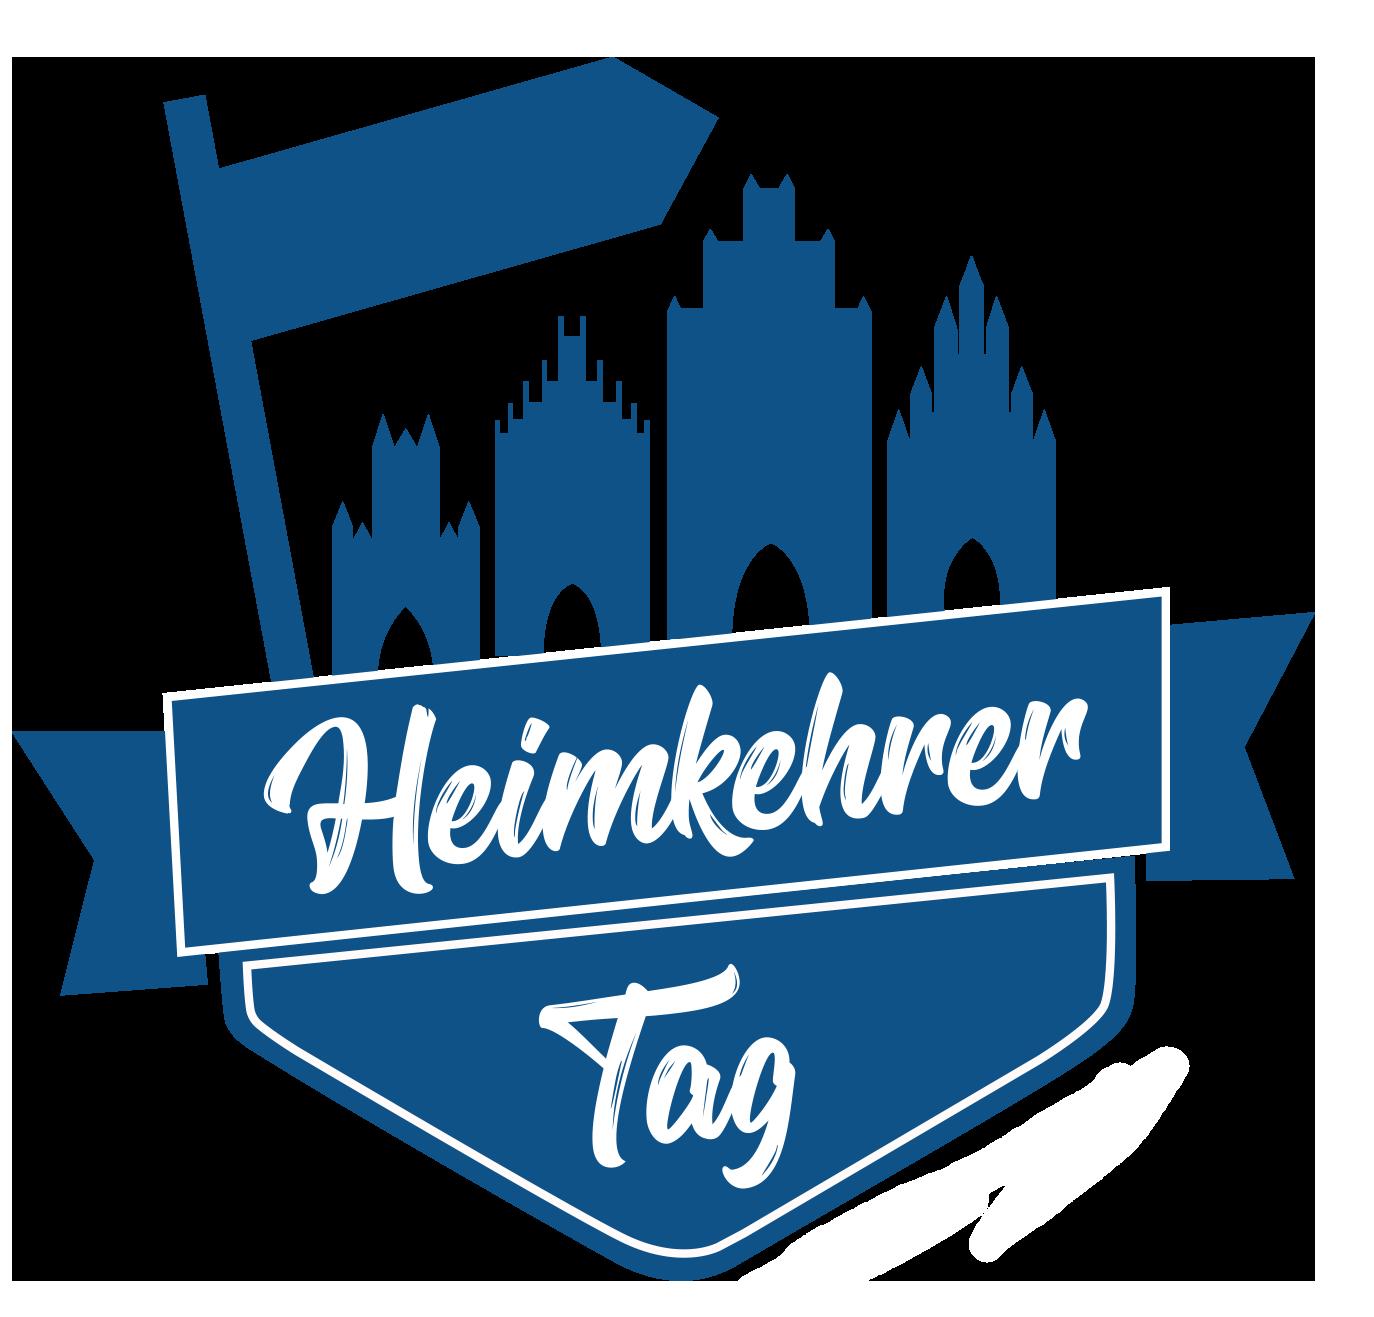 sensor24 - HeimkehrerTag 2019